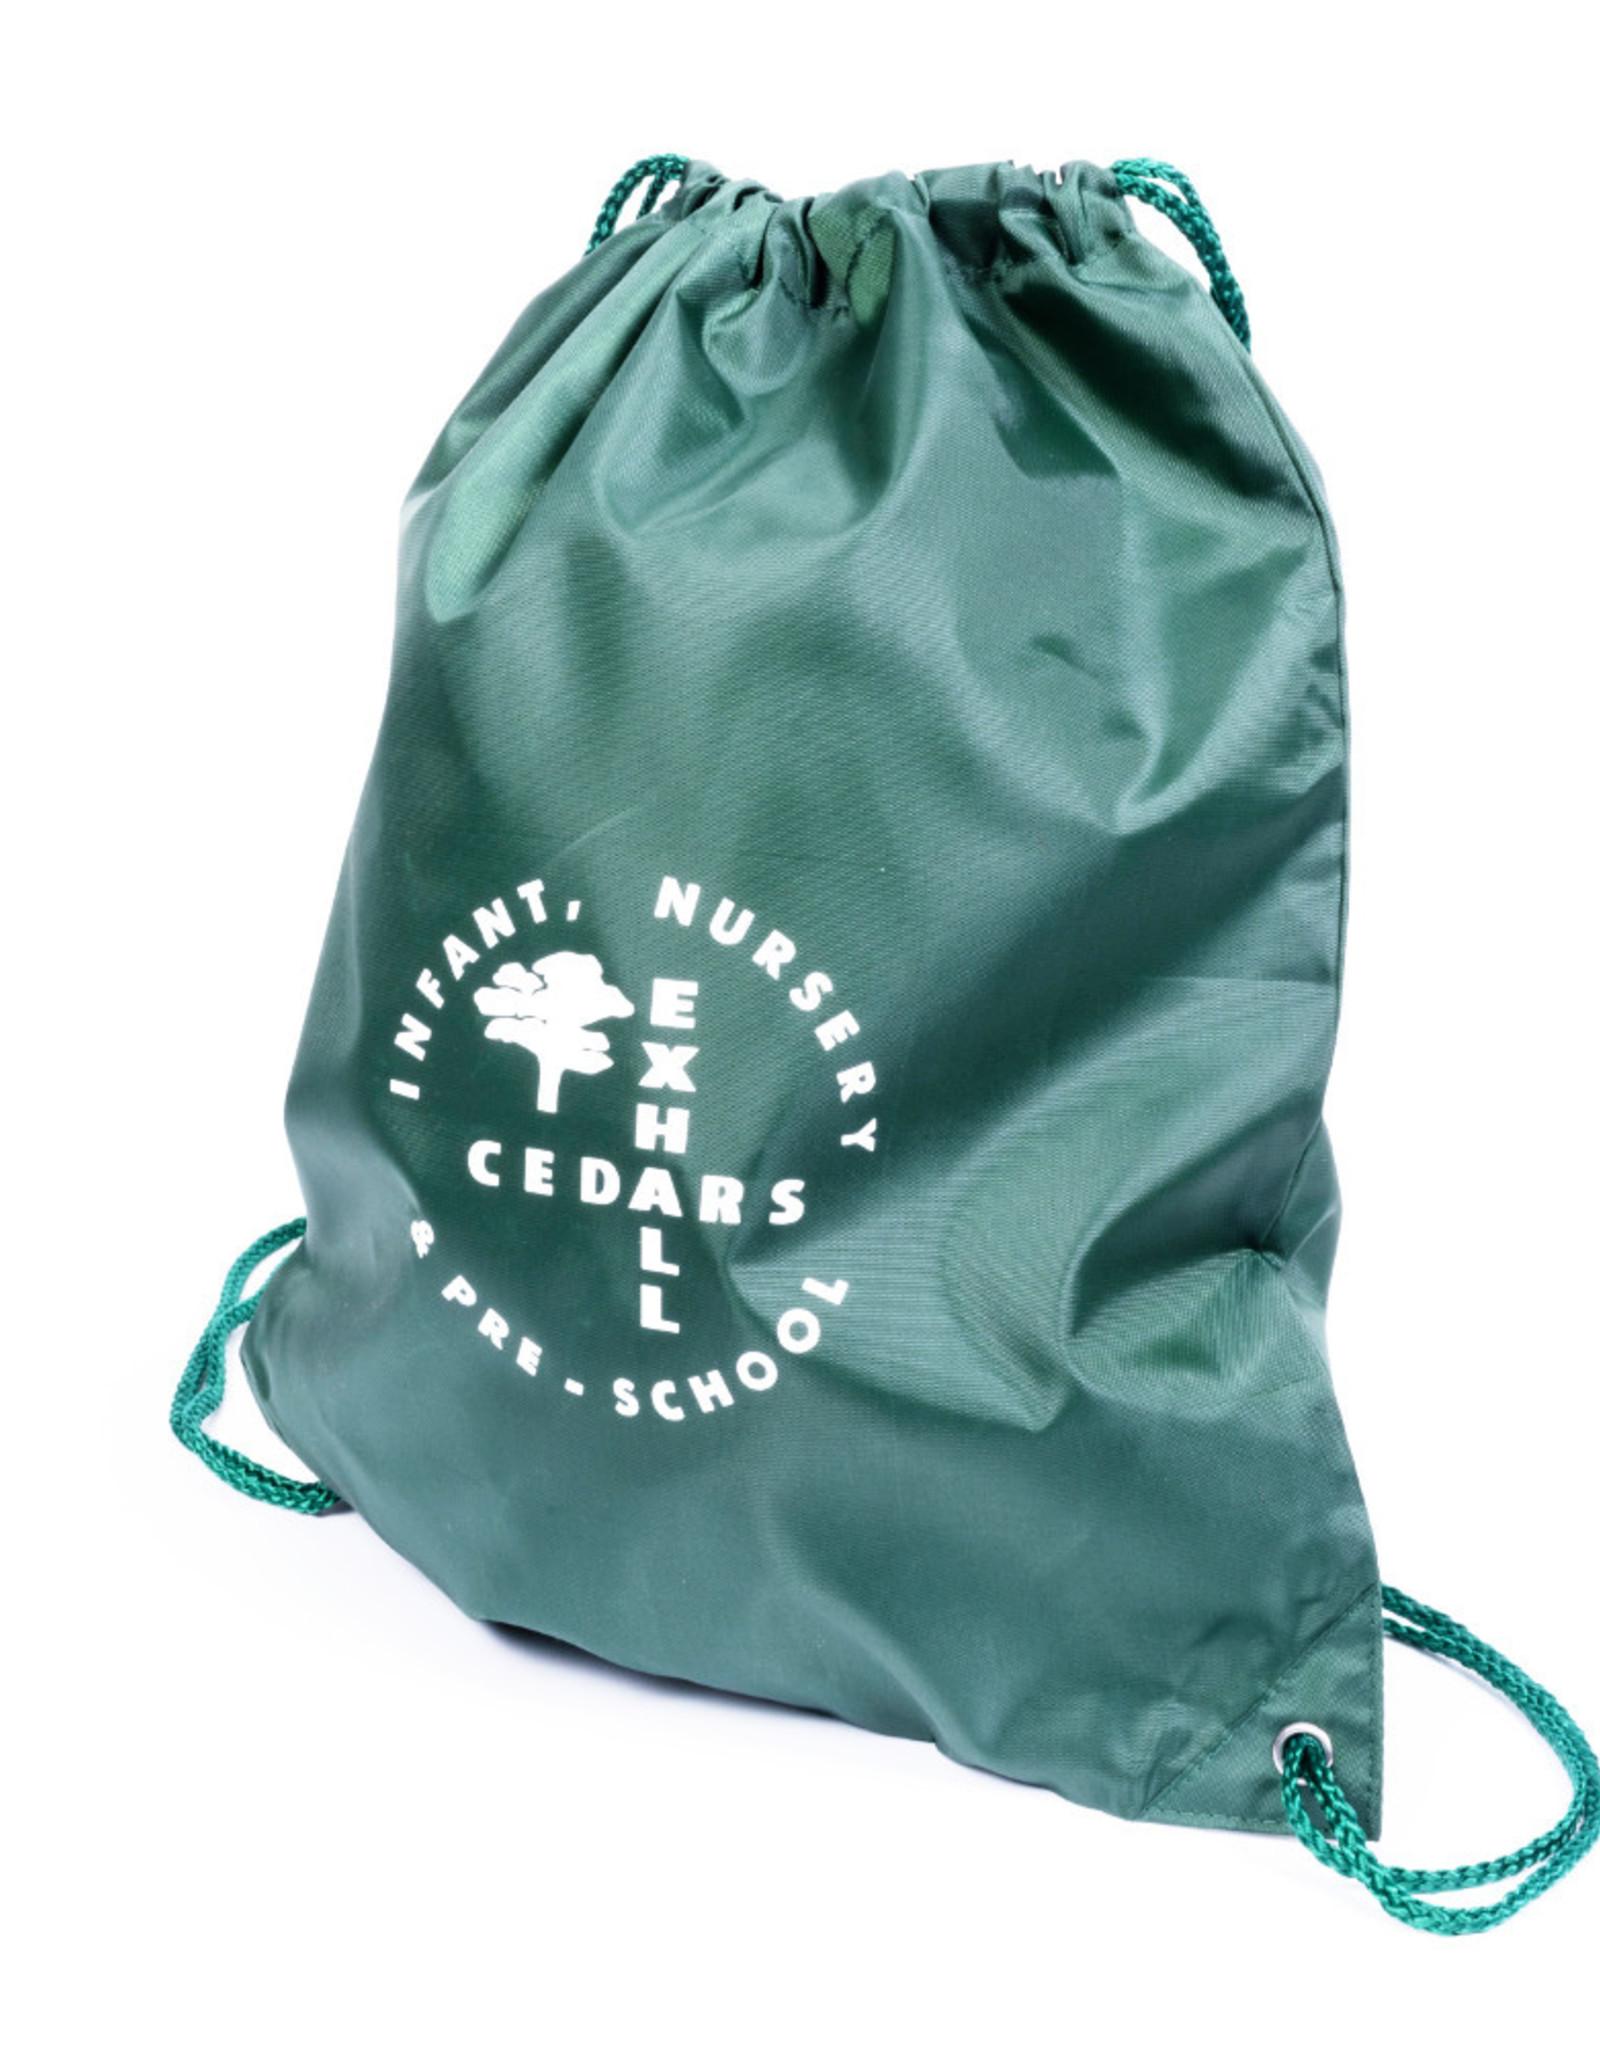 Green Unisex Gym Sac - Exhall Cedars